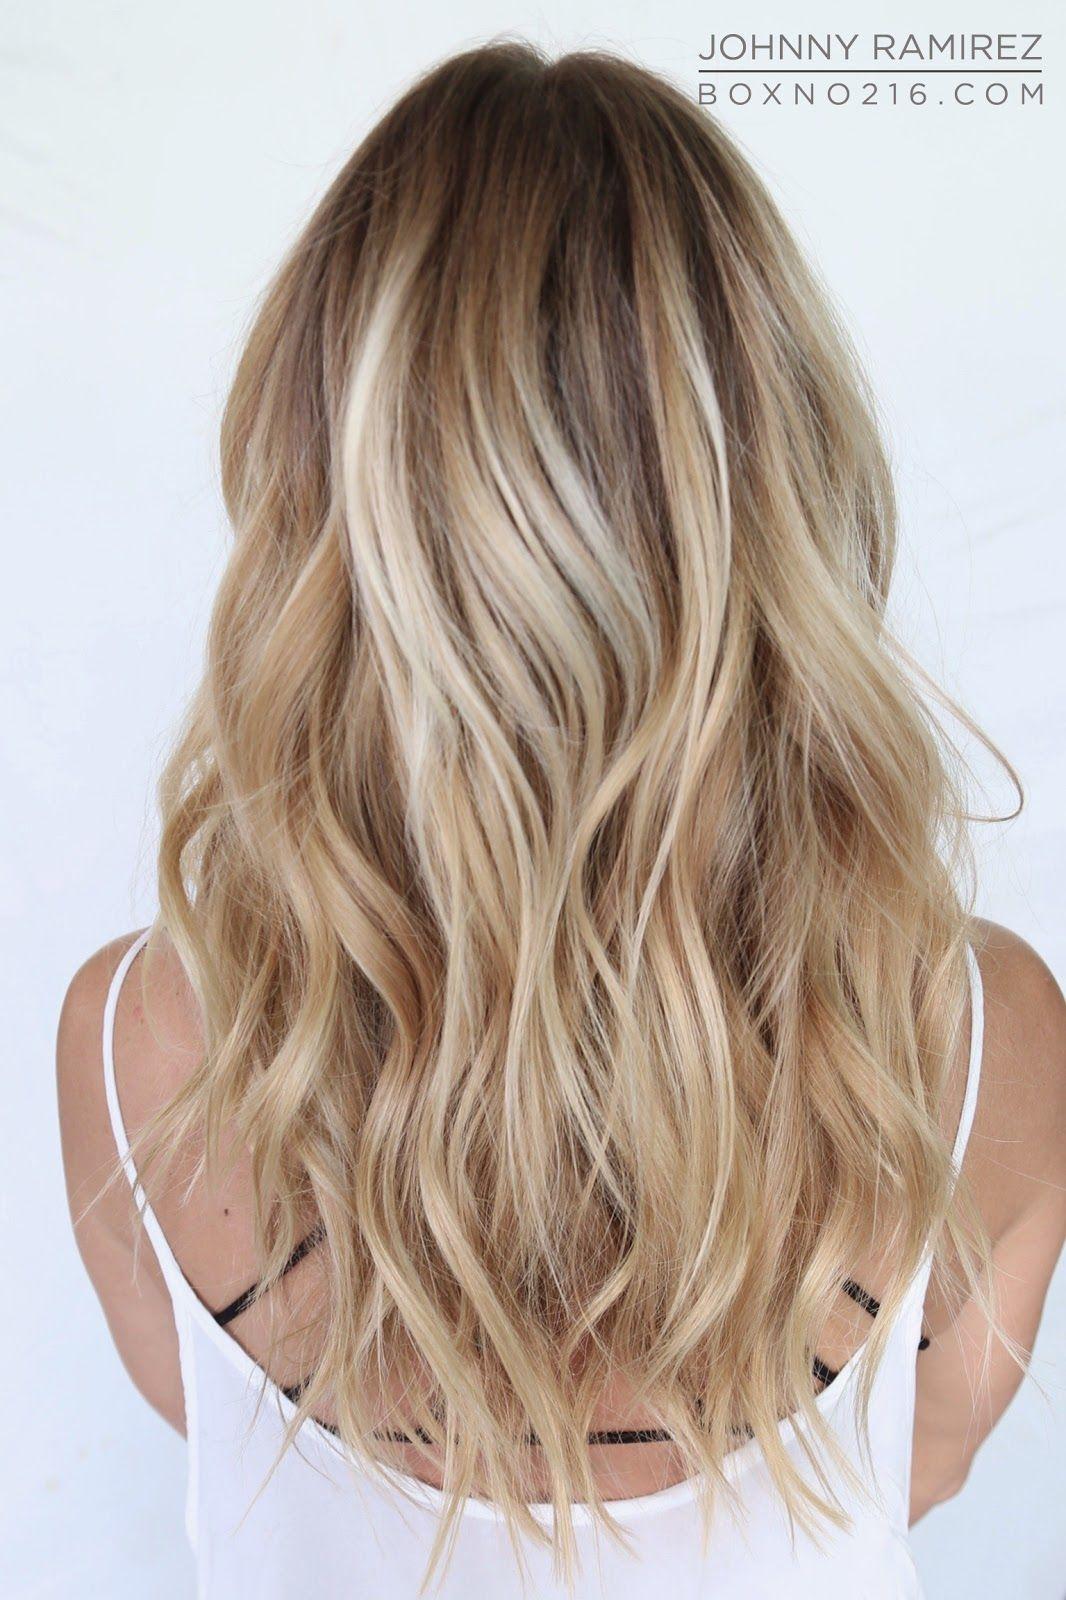 Beachy blonde in miami hair color by johnny ramirez u ig